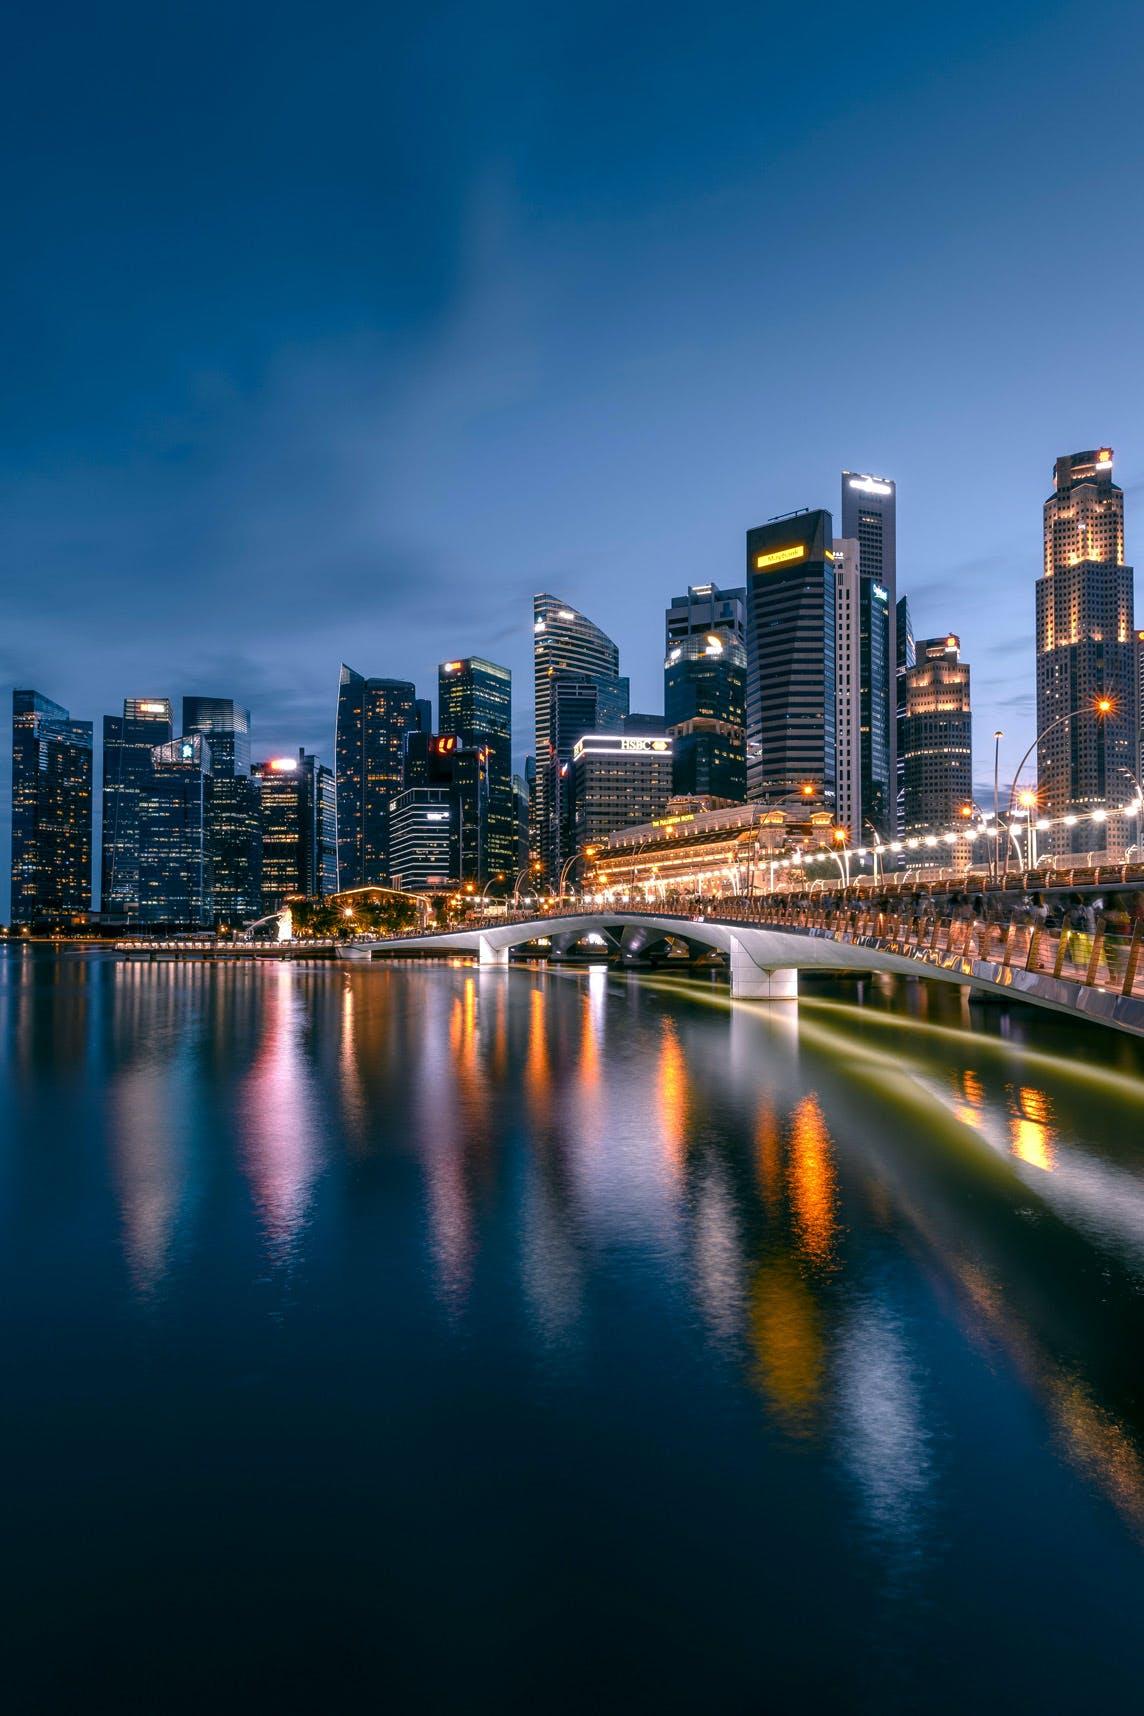 Jubilee Bridge & Singapore Skyline